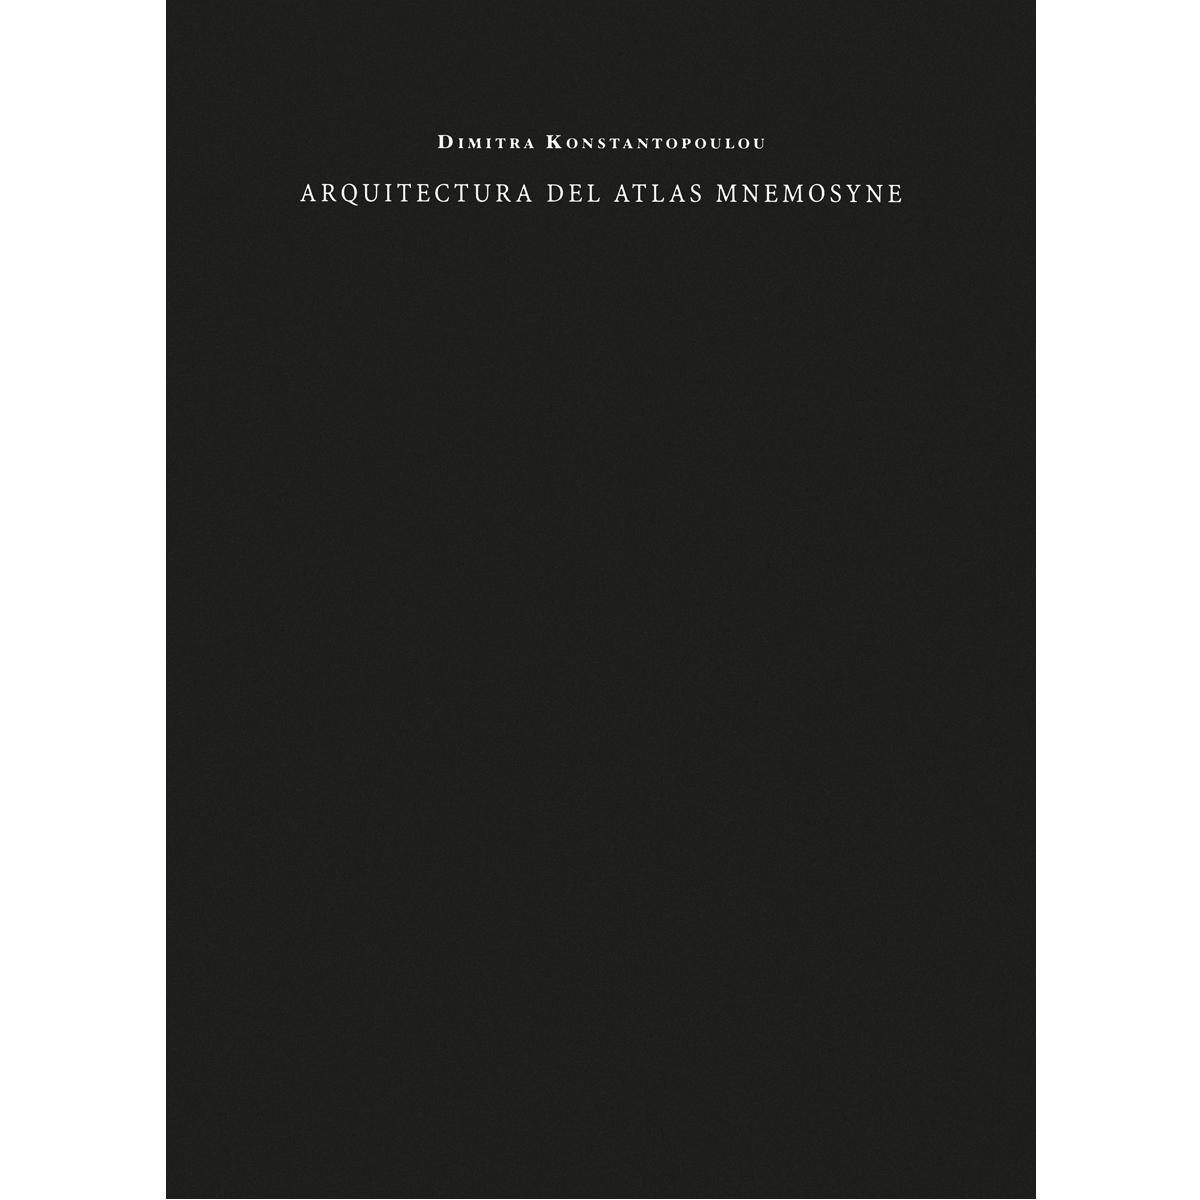 Arquitectura del Atlas Mnemosyne